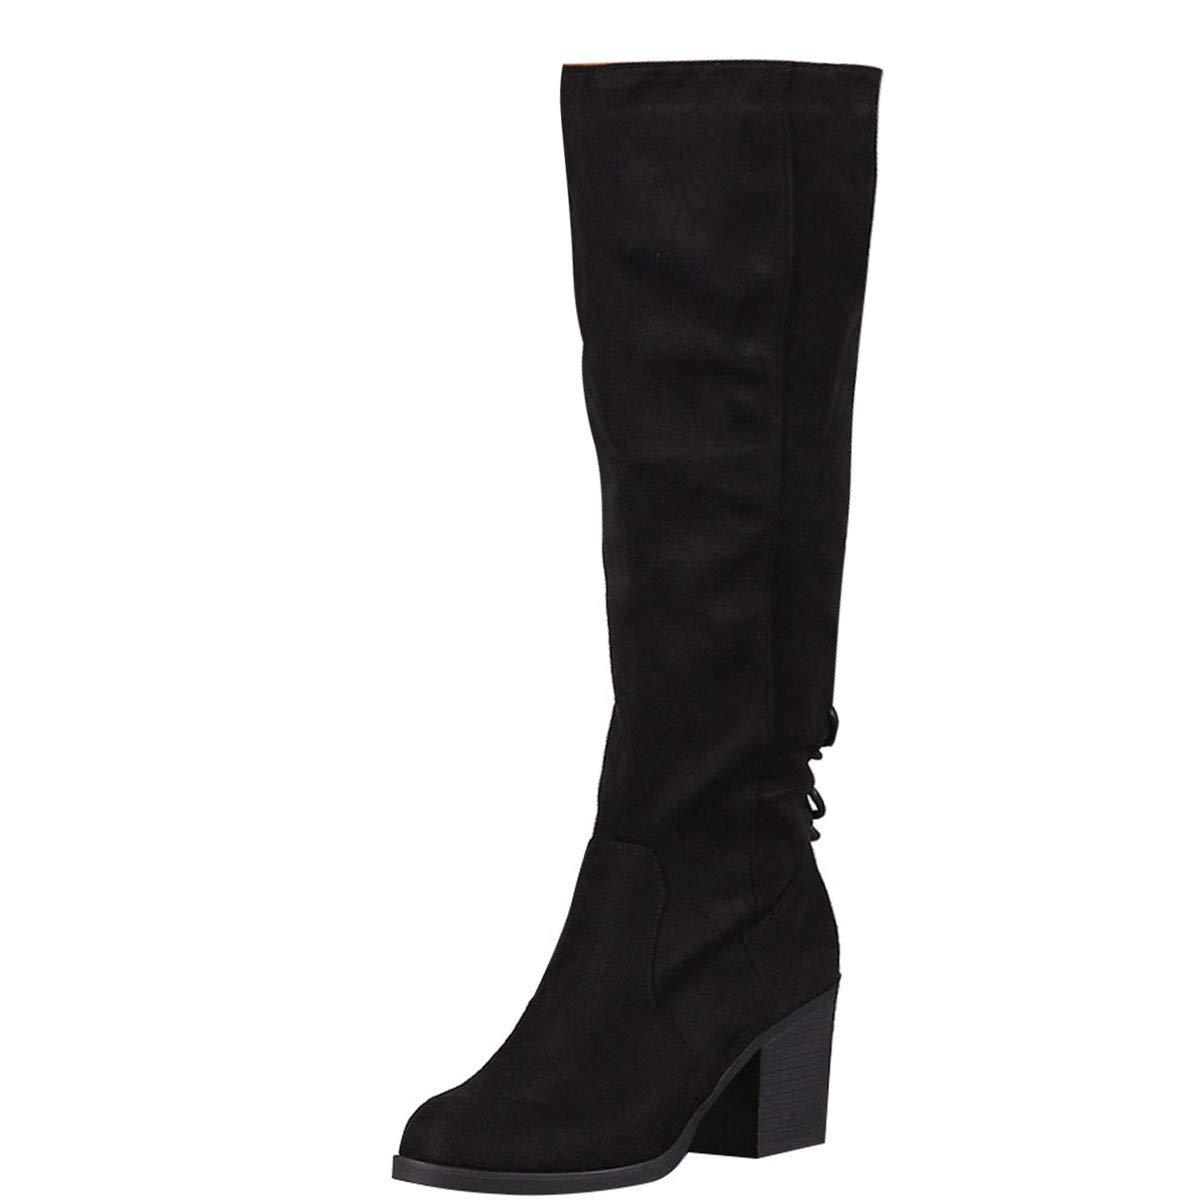 9cec87e7bac Amazon.com | BAMBOO Womens Round Toe Chunky Med High Heel Lace Up ...